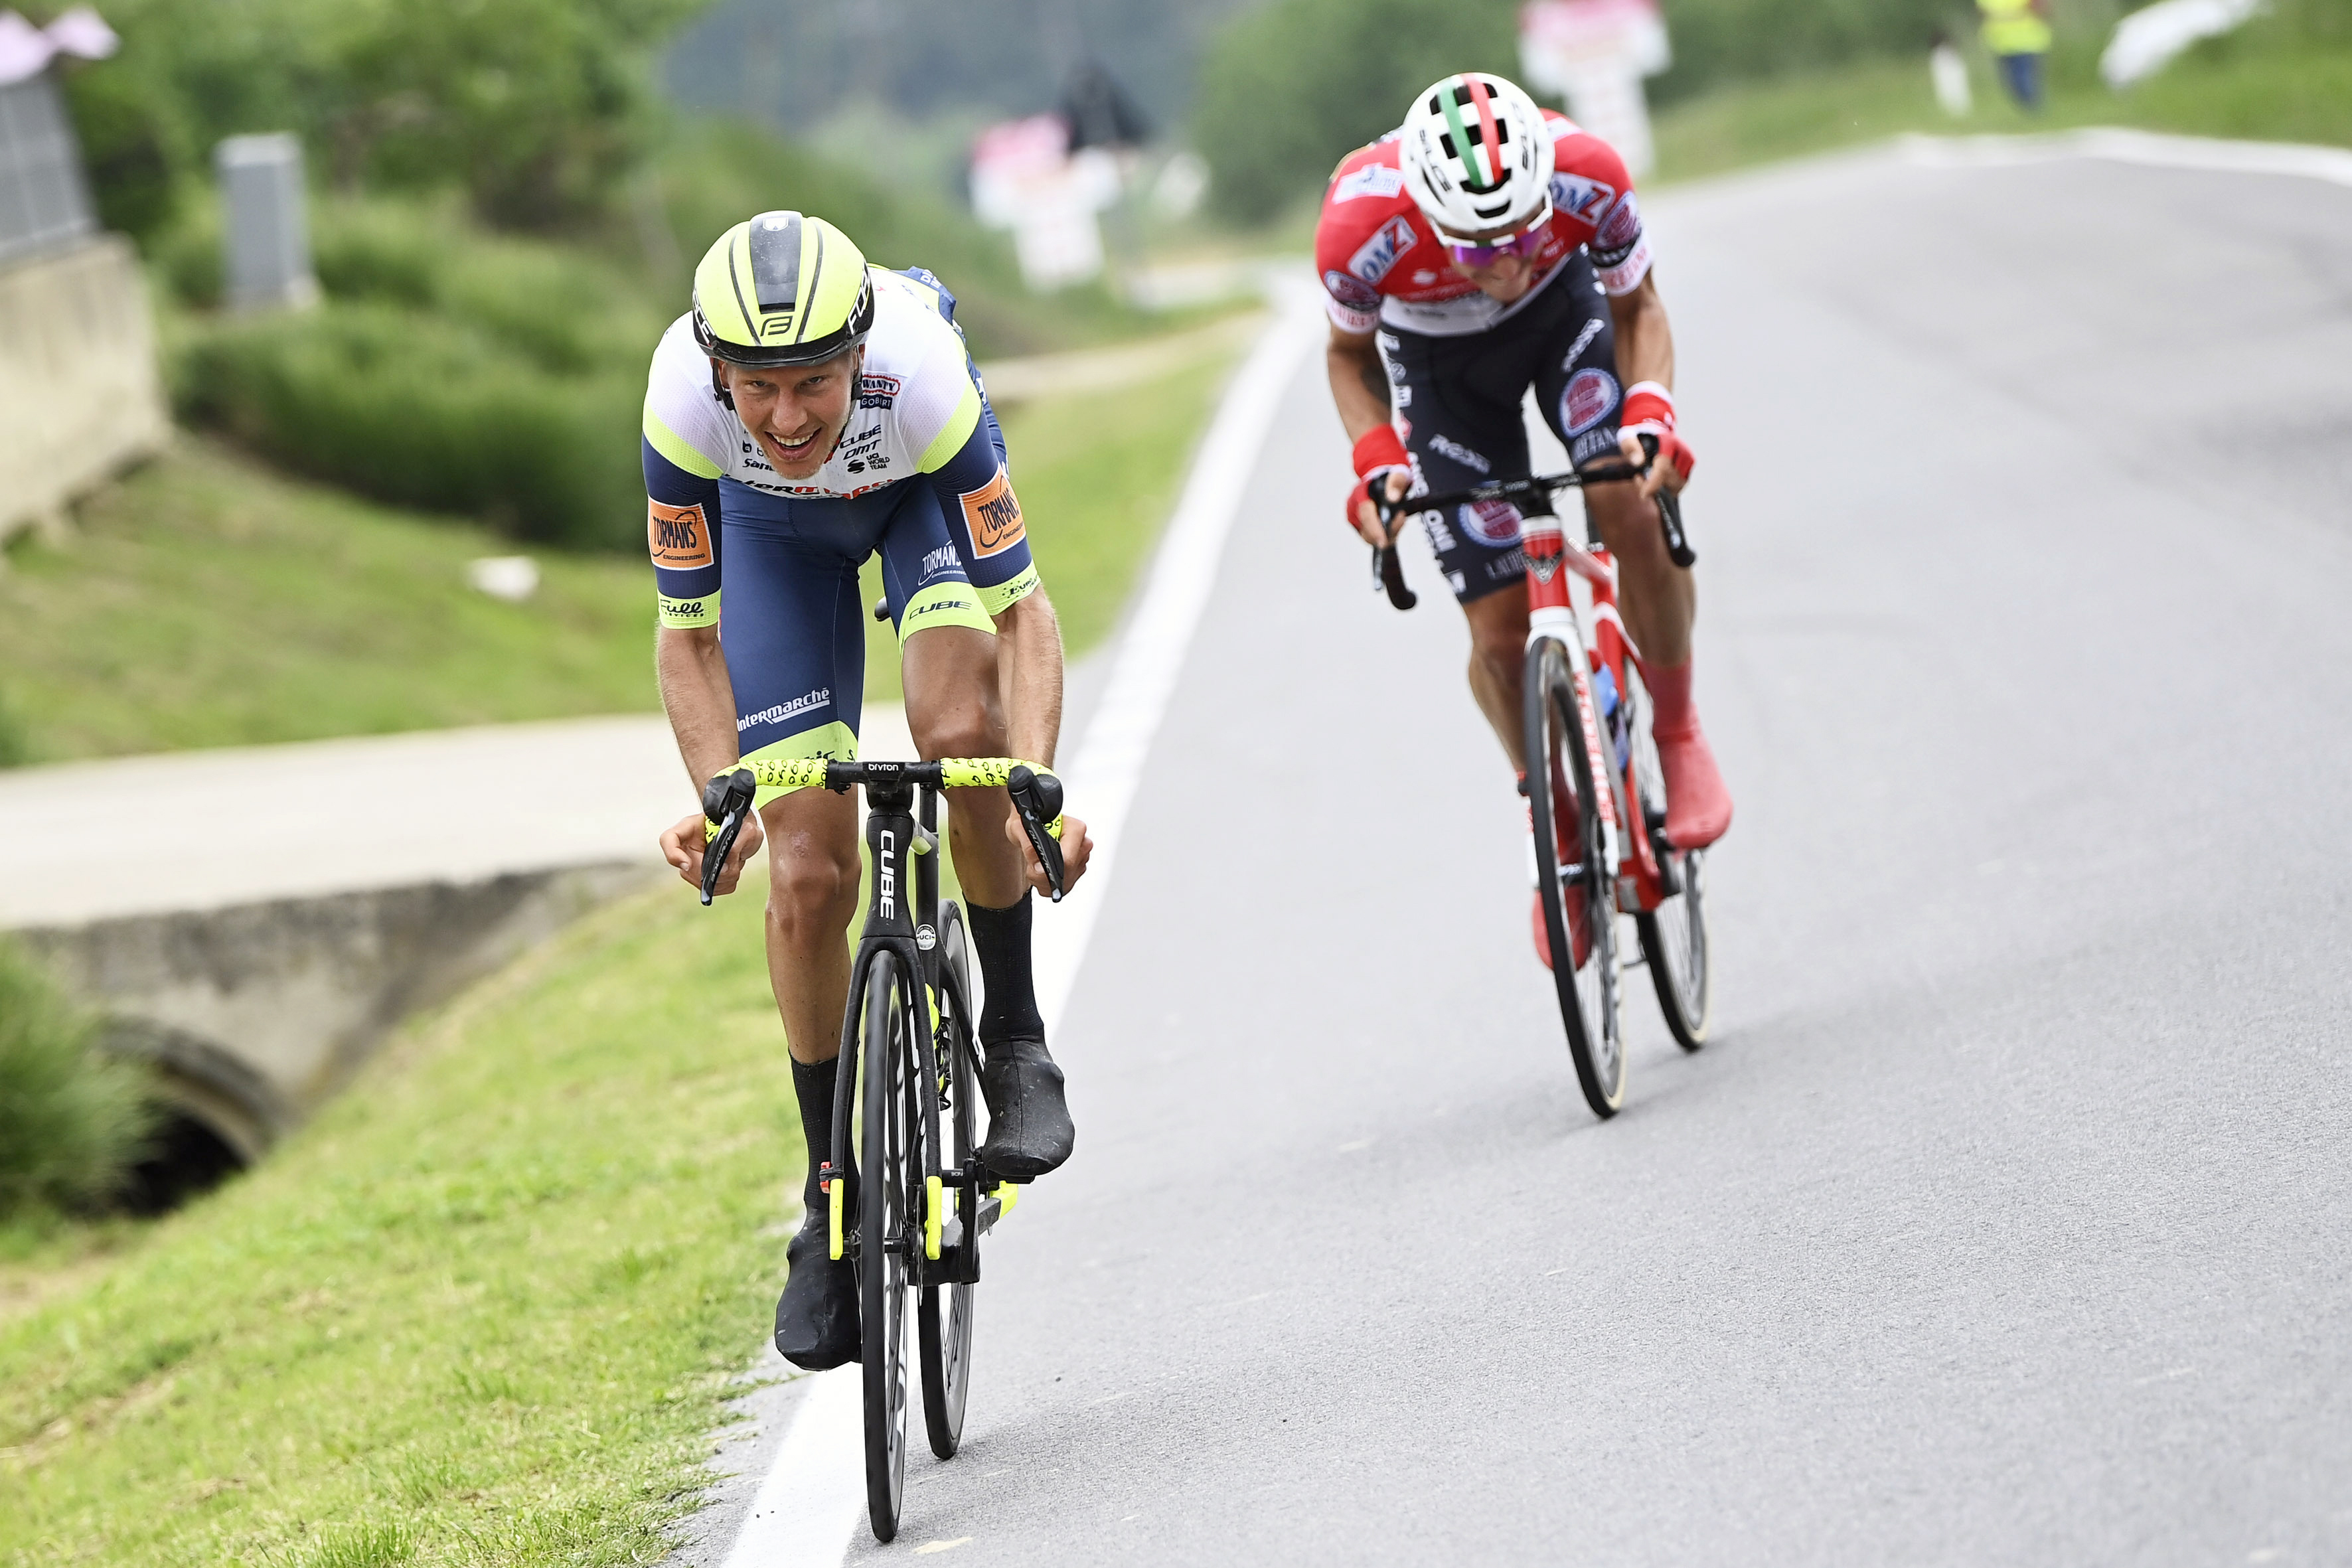 Pellaud, detrás de Van der Hoorn, en la tercera etapa